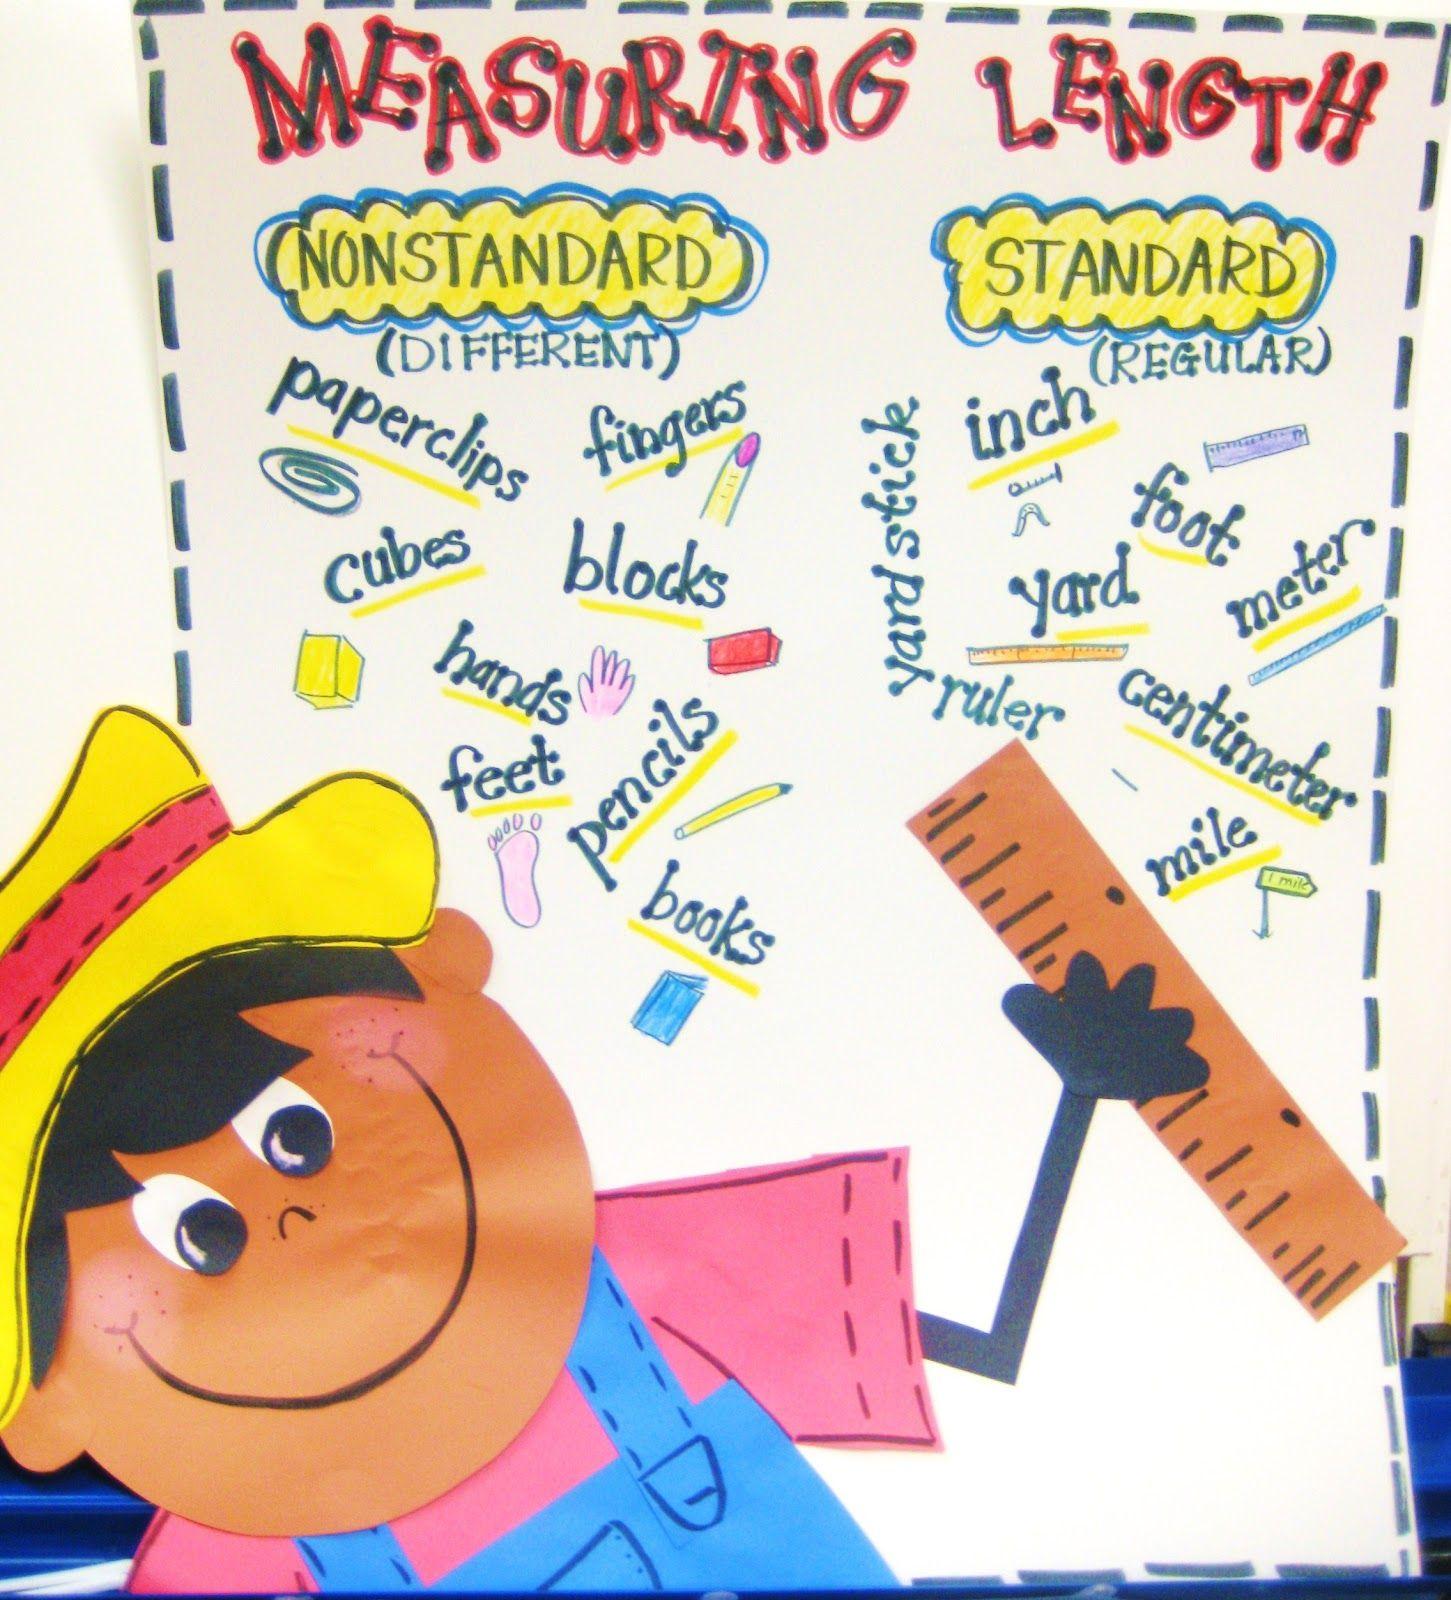 Standard Measuring Tools For Kids